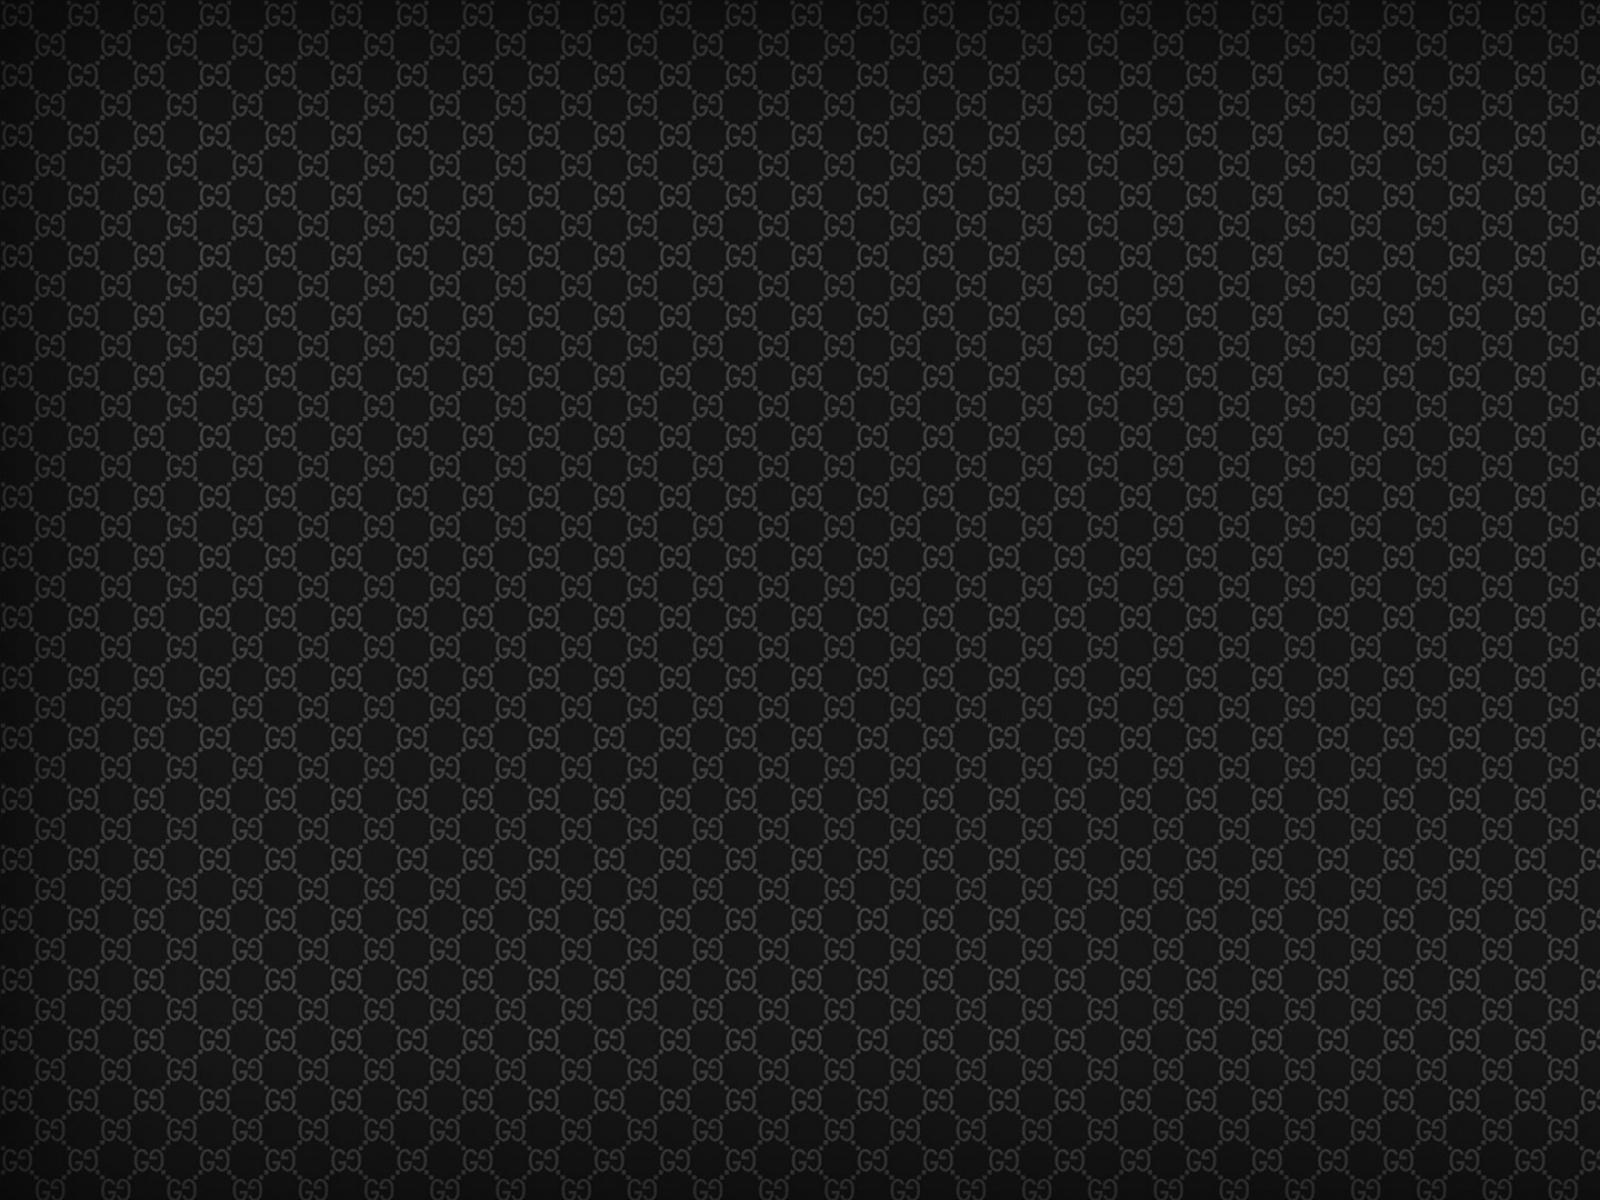 black patterns textures gucci designer label 1922x1080 wallpaper Art 1600x1200